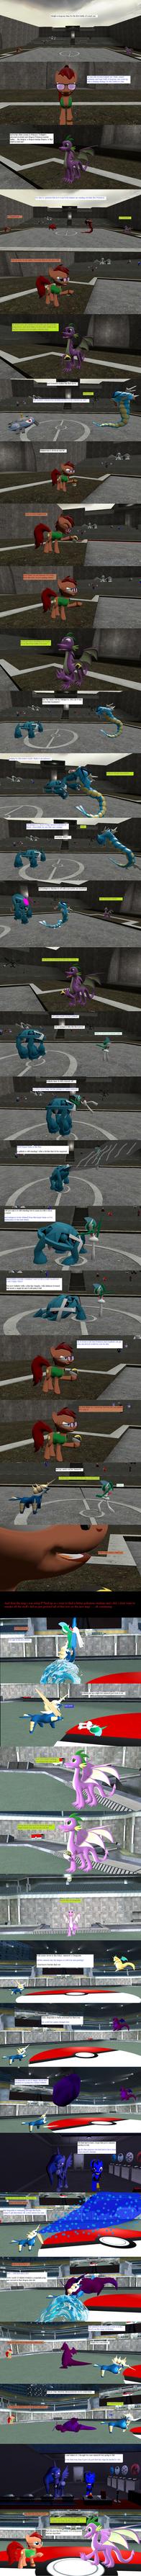 pokemon tournament Jay vs Spike by kxp71